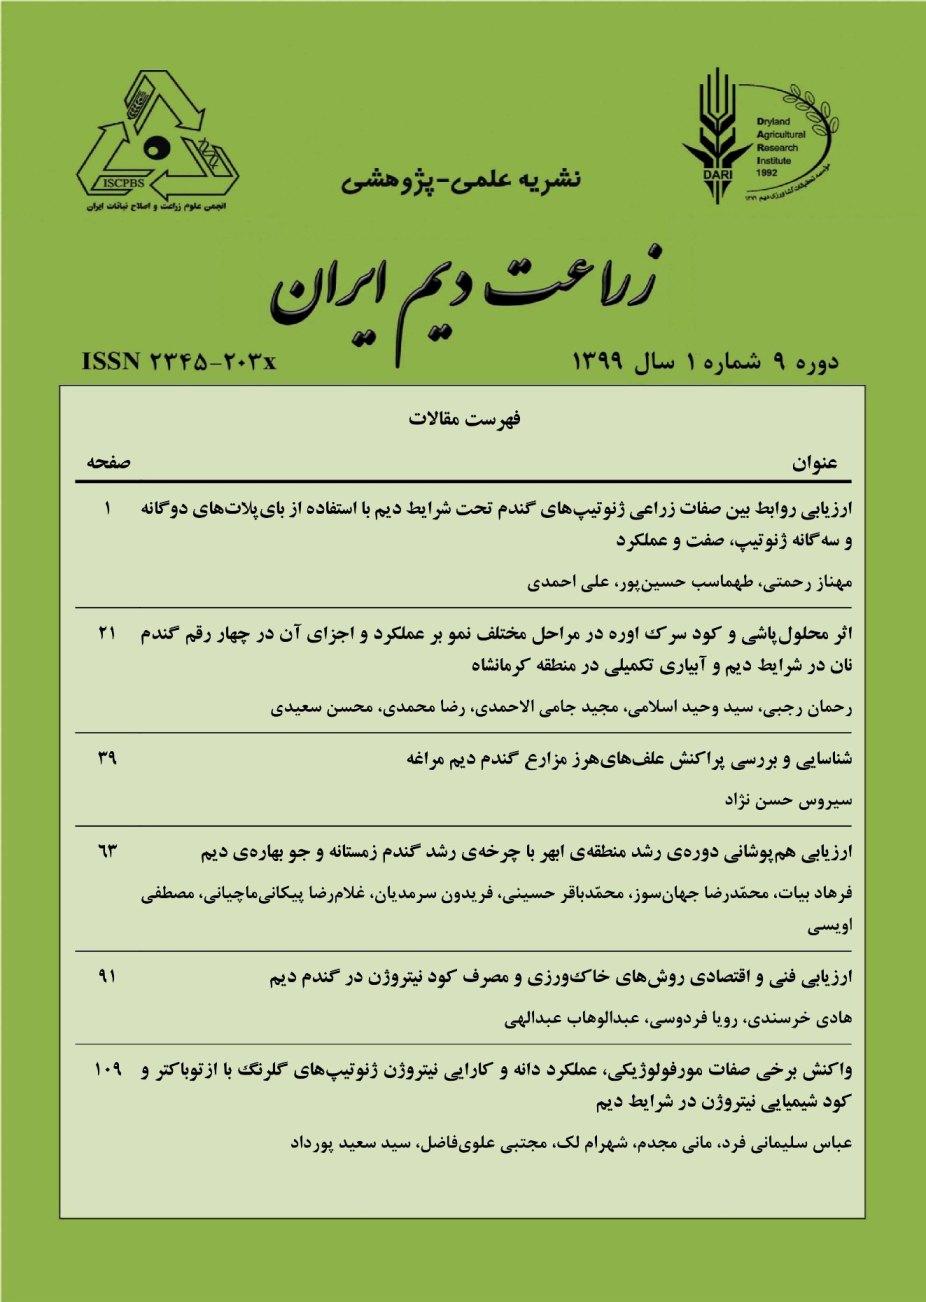 زراعت دیم ایران